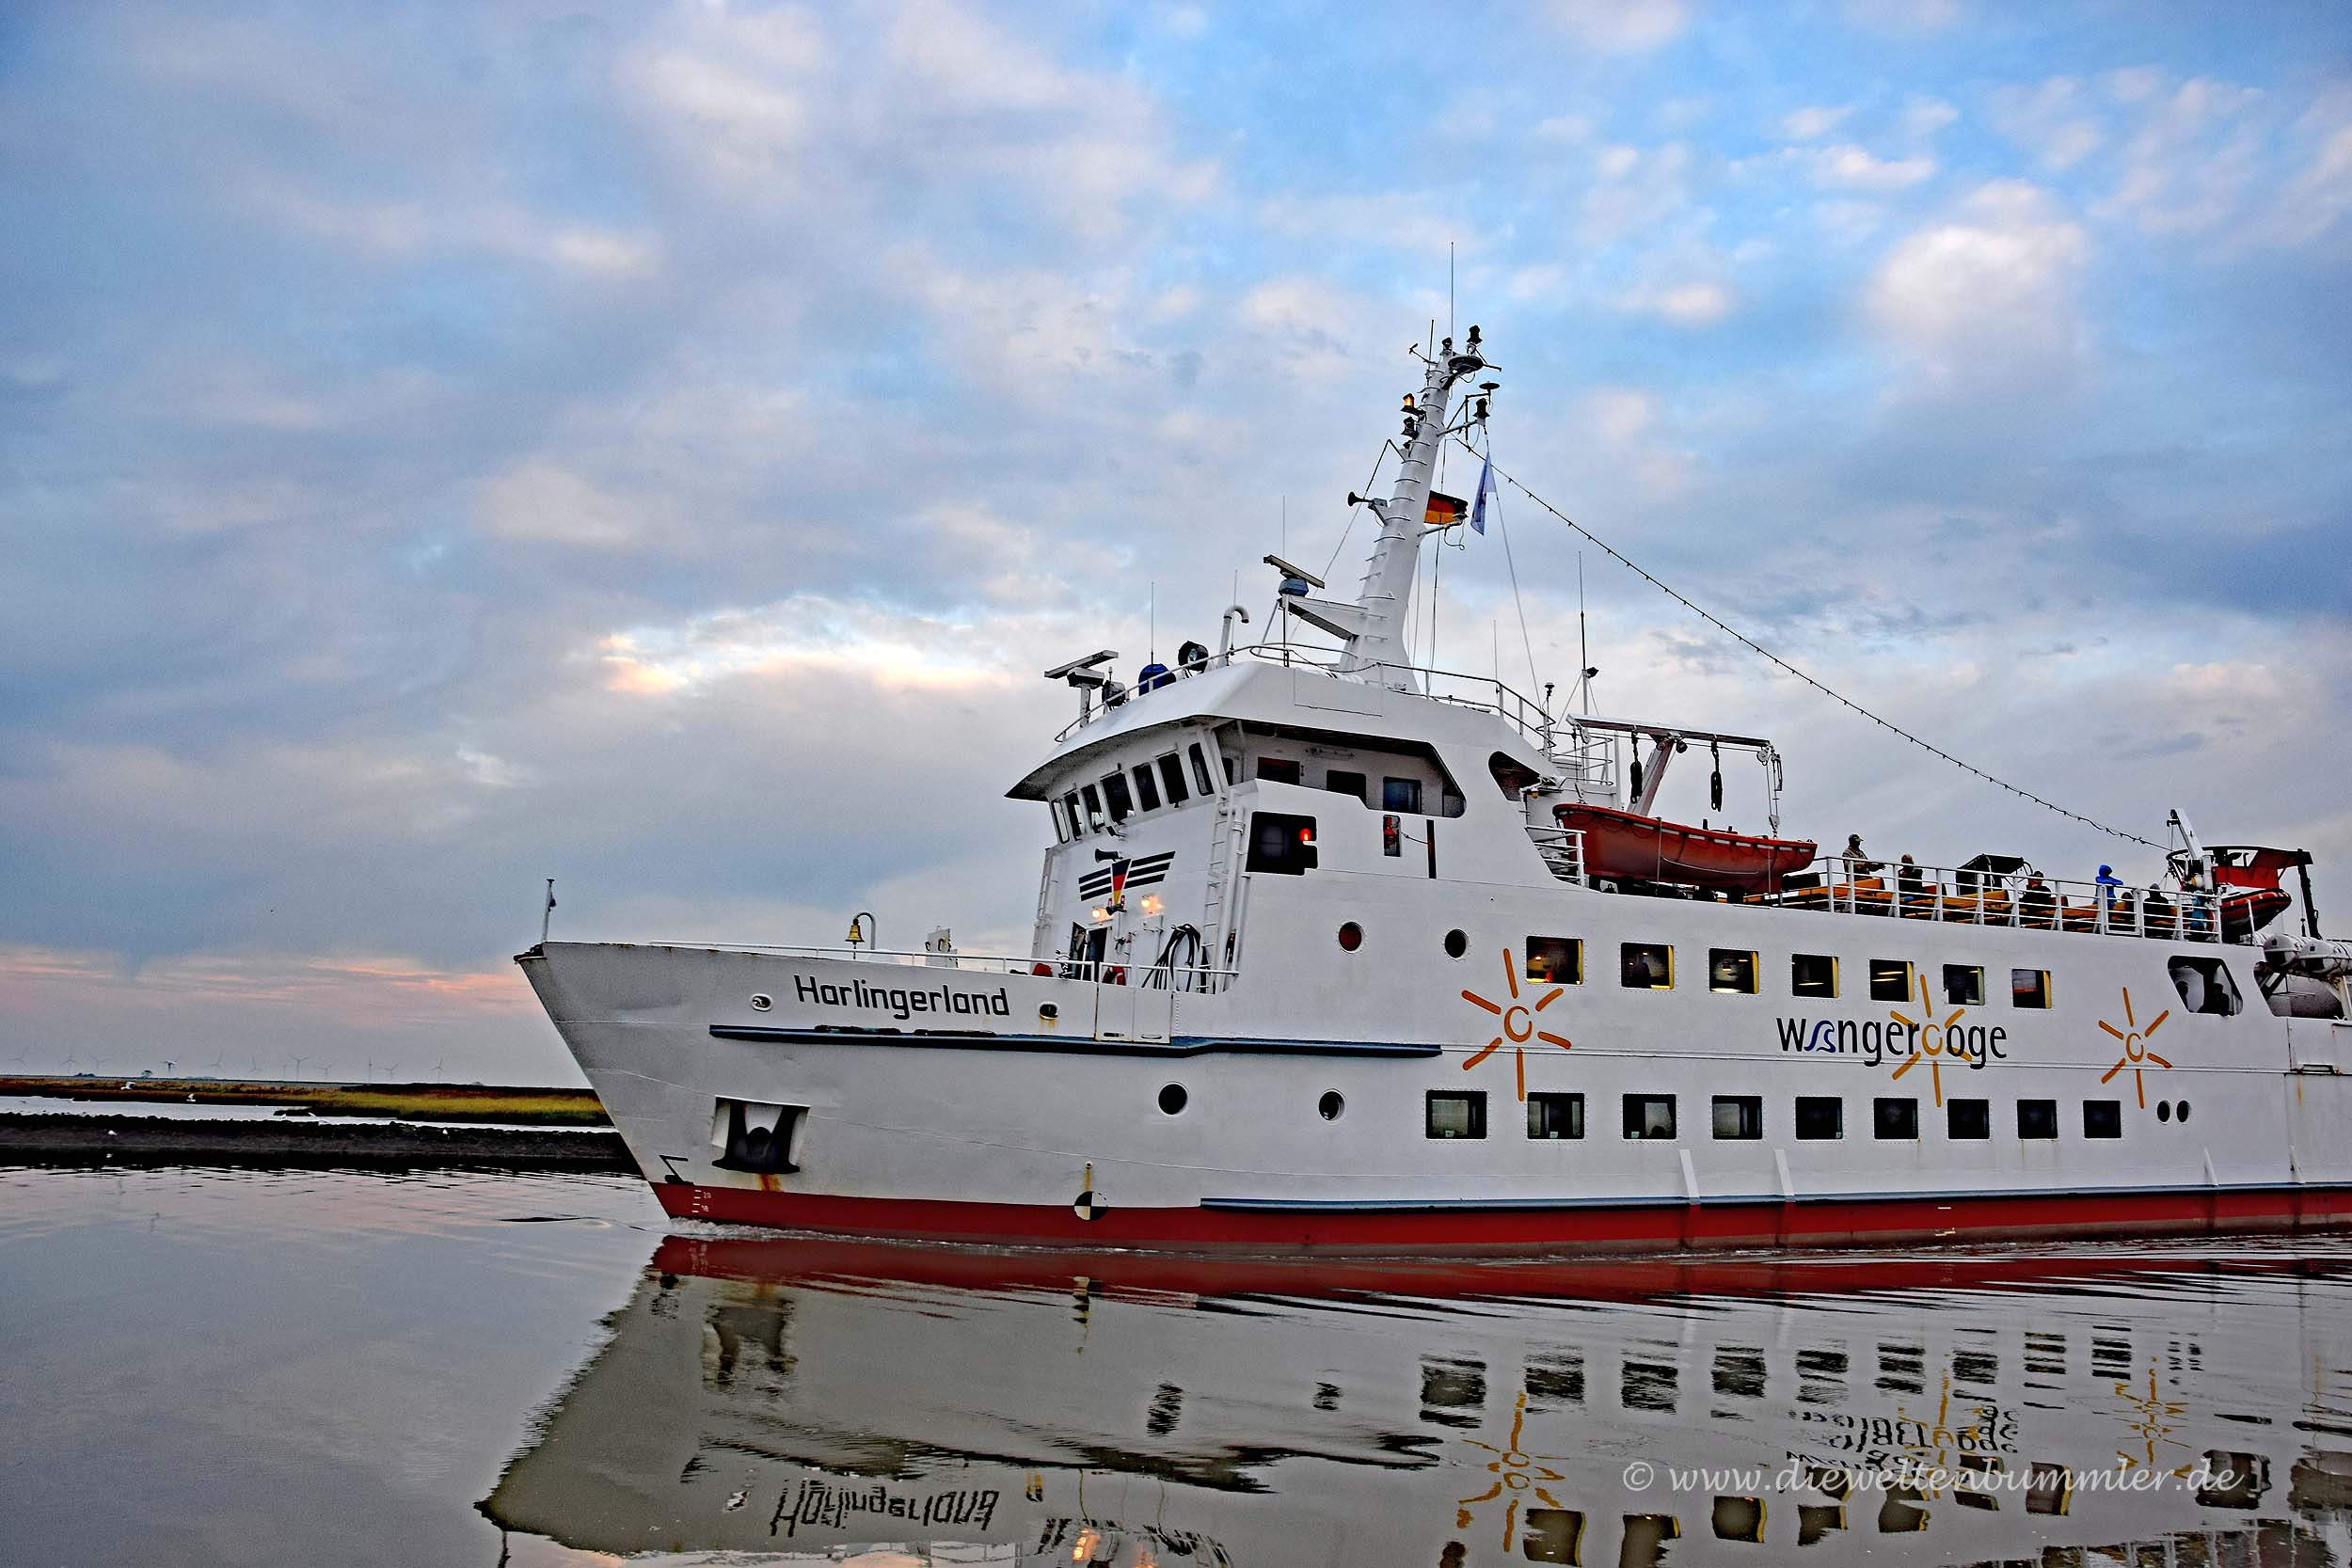 Schiff Harlingerland